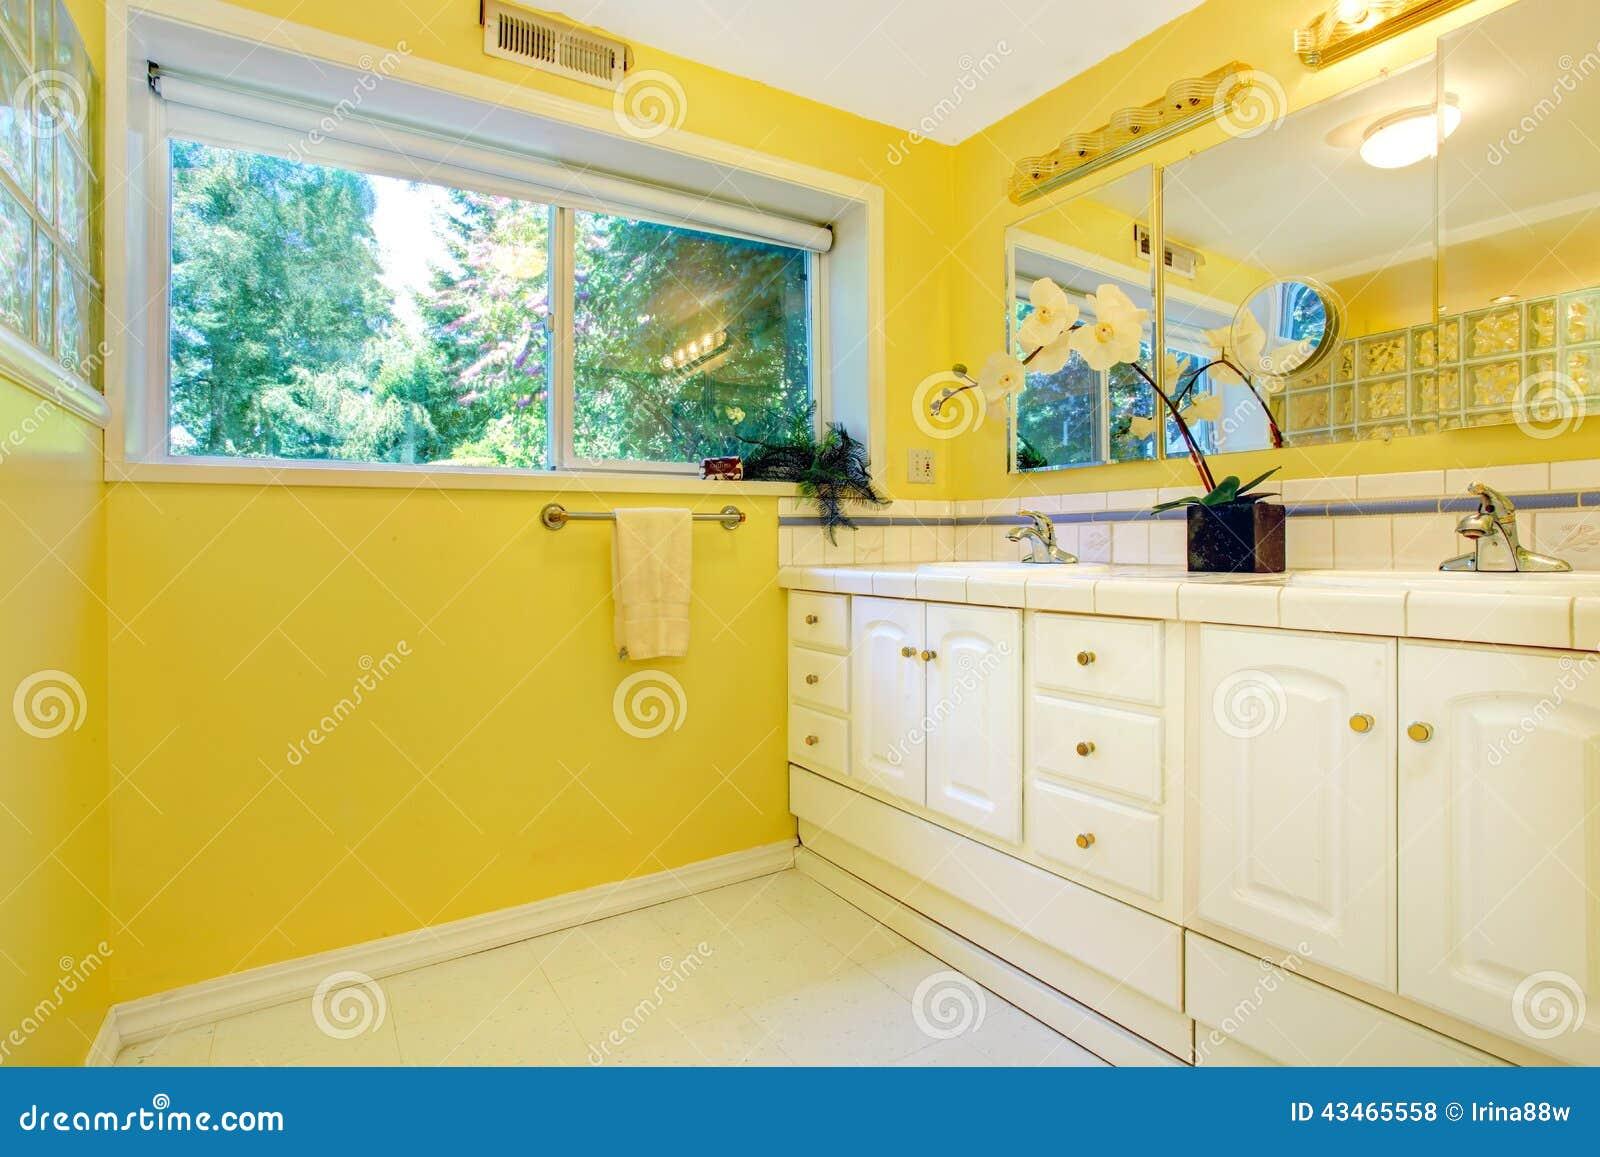 Bright yellow bathroom interior Royalty Free Stock Photos. Bright Yellow Bathroom Interior Stock Photo   Image  47579434